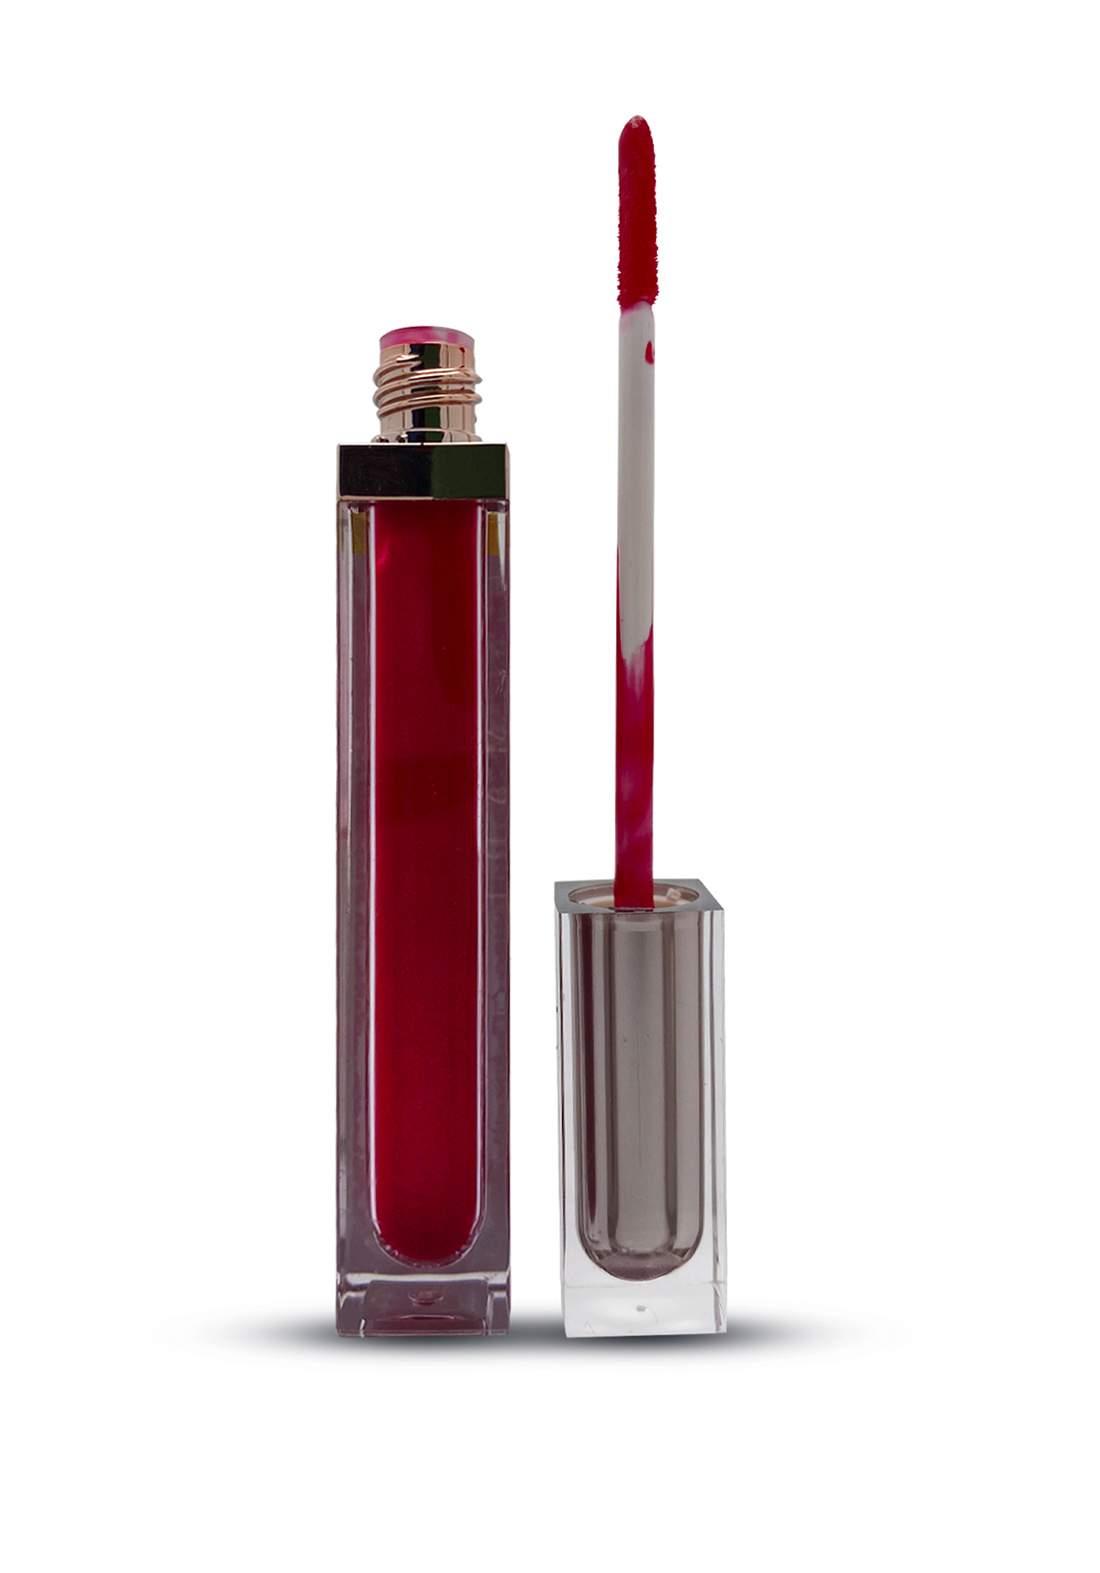 Passion ReveTint lips - Red تنت ريڤ للشفاه والخدود